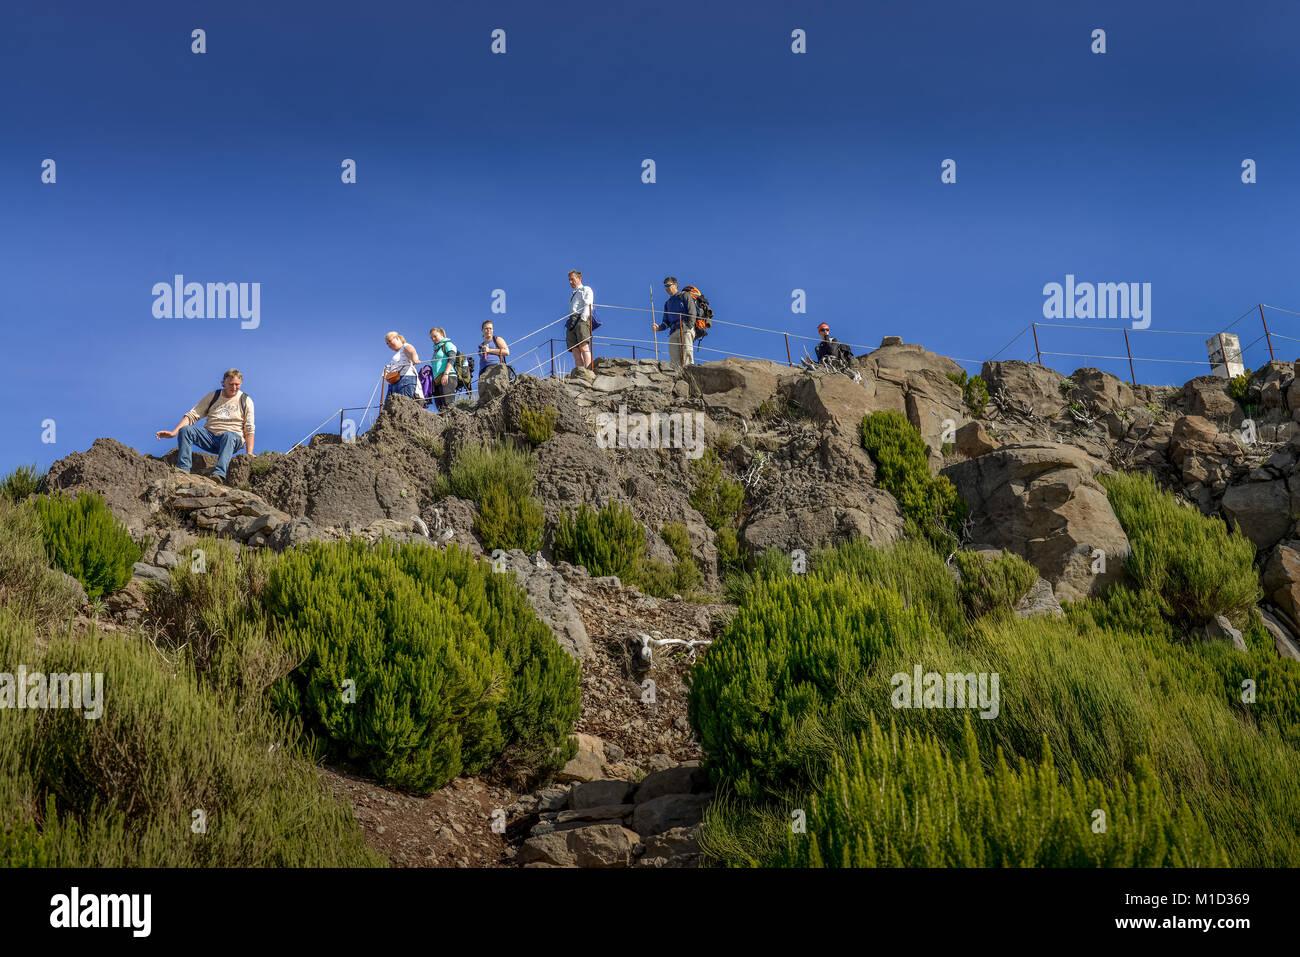 Summit of Pico Ruivo, Central Mountains, Madeira, Portugal, Gipfel des Pico Ruivo, Zentralgebirge - Stock Image